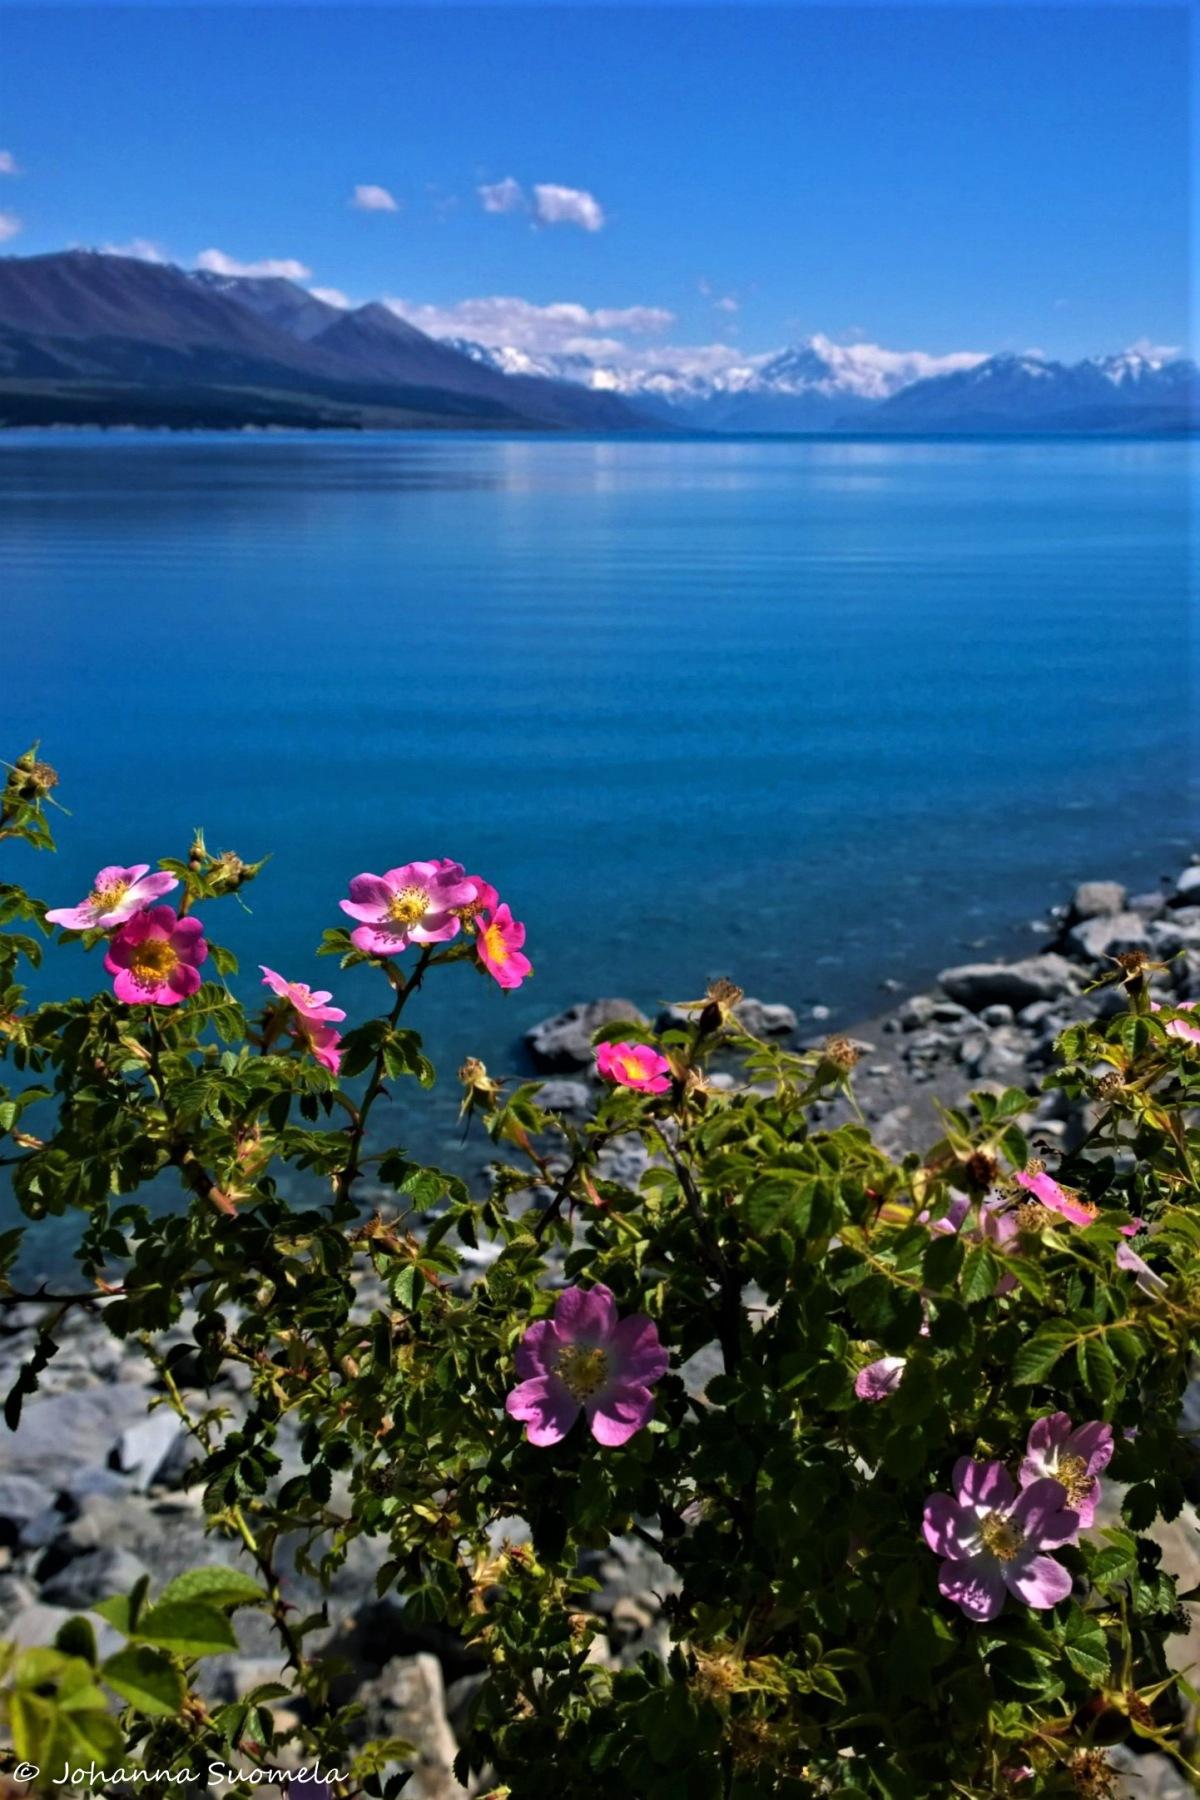 Uusi-Seelanti Lake Pukaki